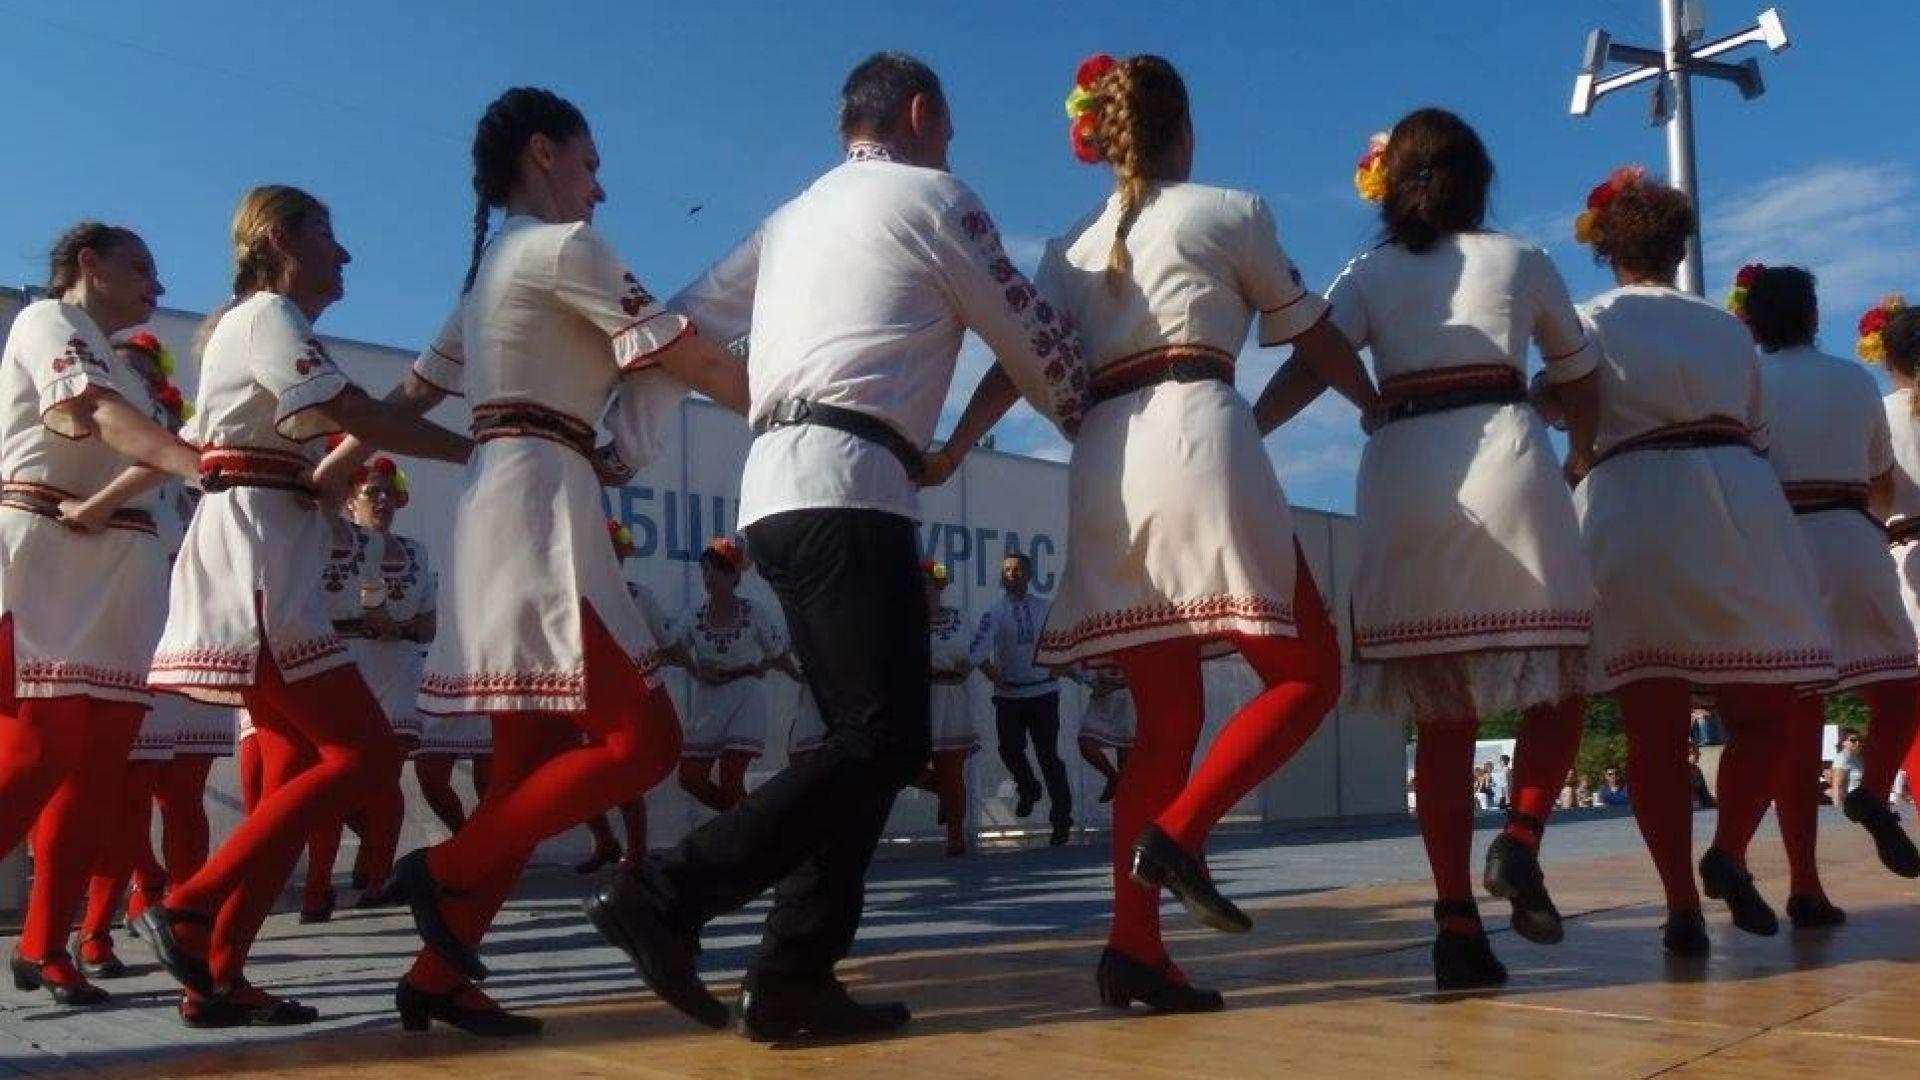 """Хоро край лазурния бряг"" събира певци и танцьори (видео)"